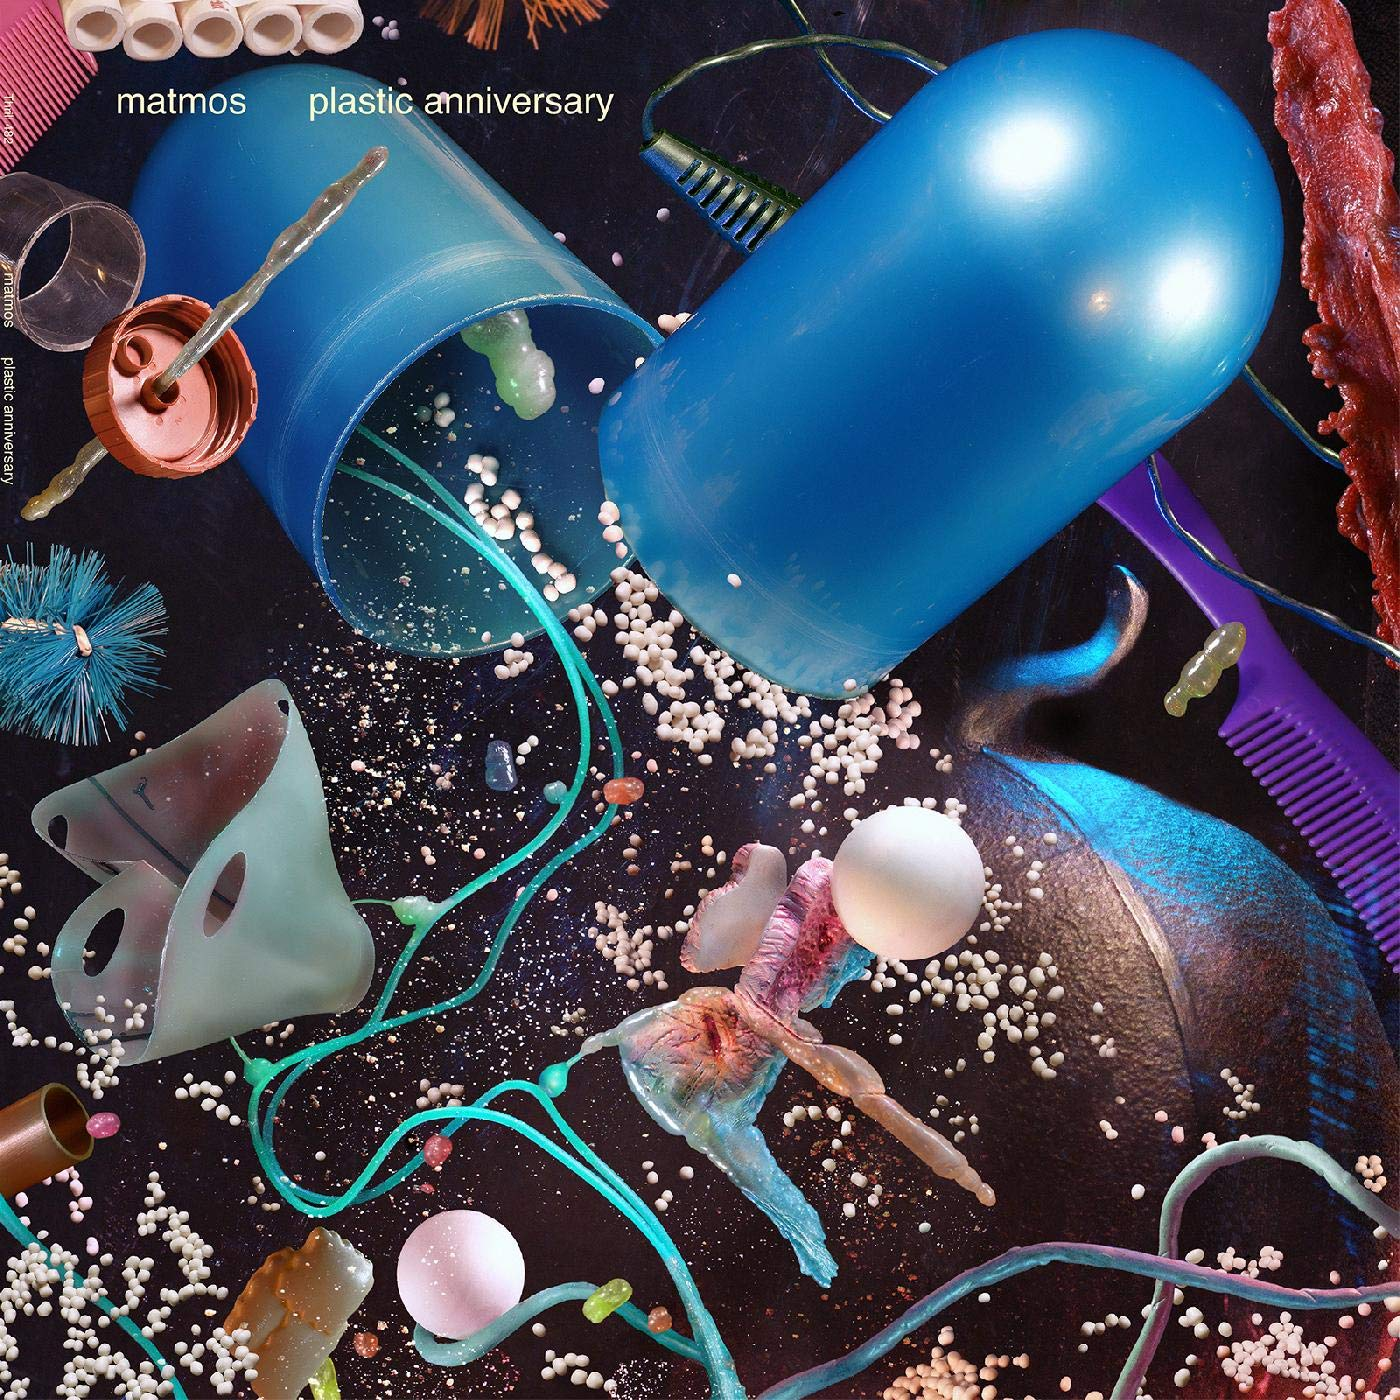 Vinilo : Matmos - Plastic Anniversary (LP Vinyl)